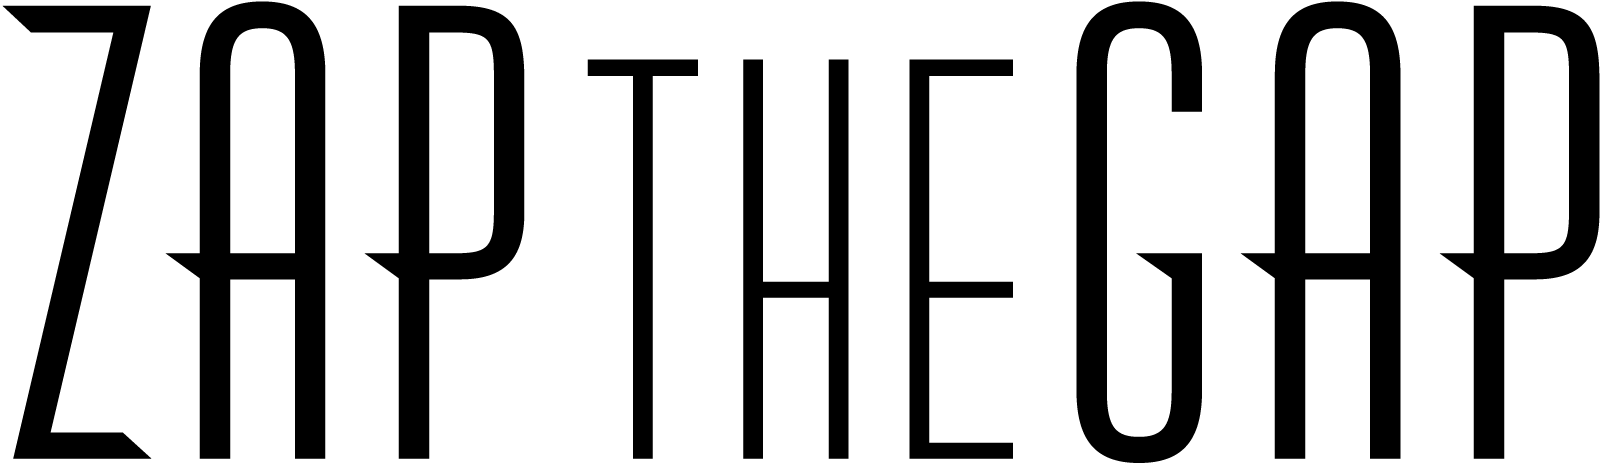 Techtacular_ZaptheGap_Logo.png